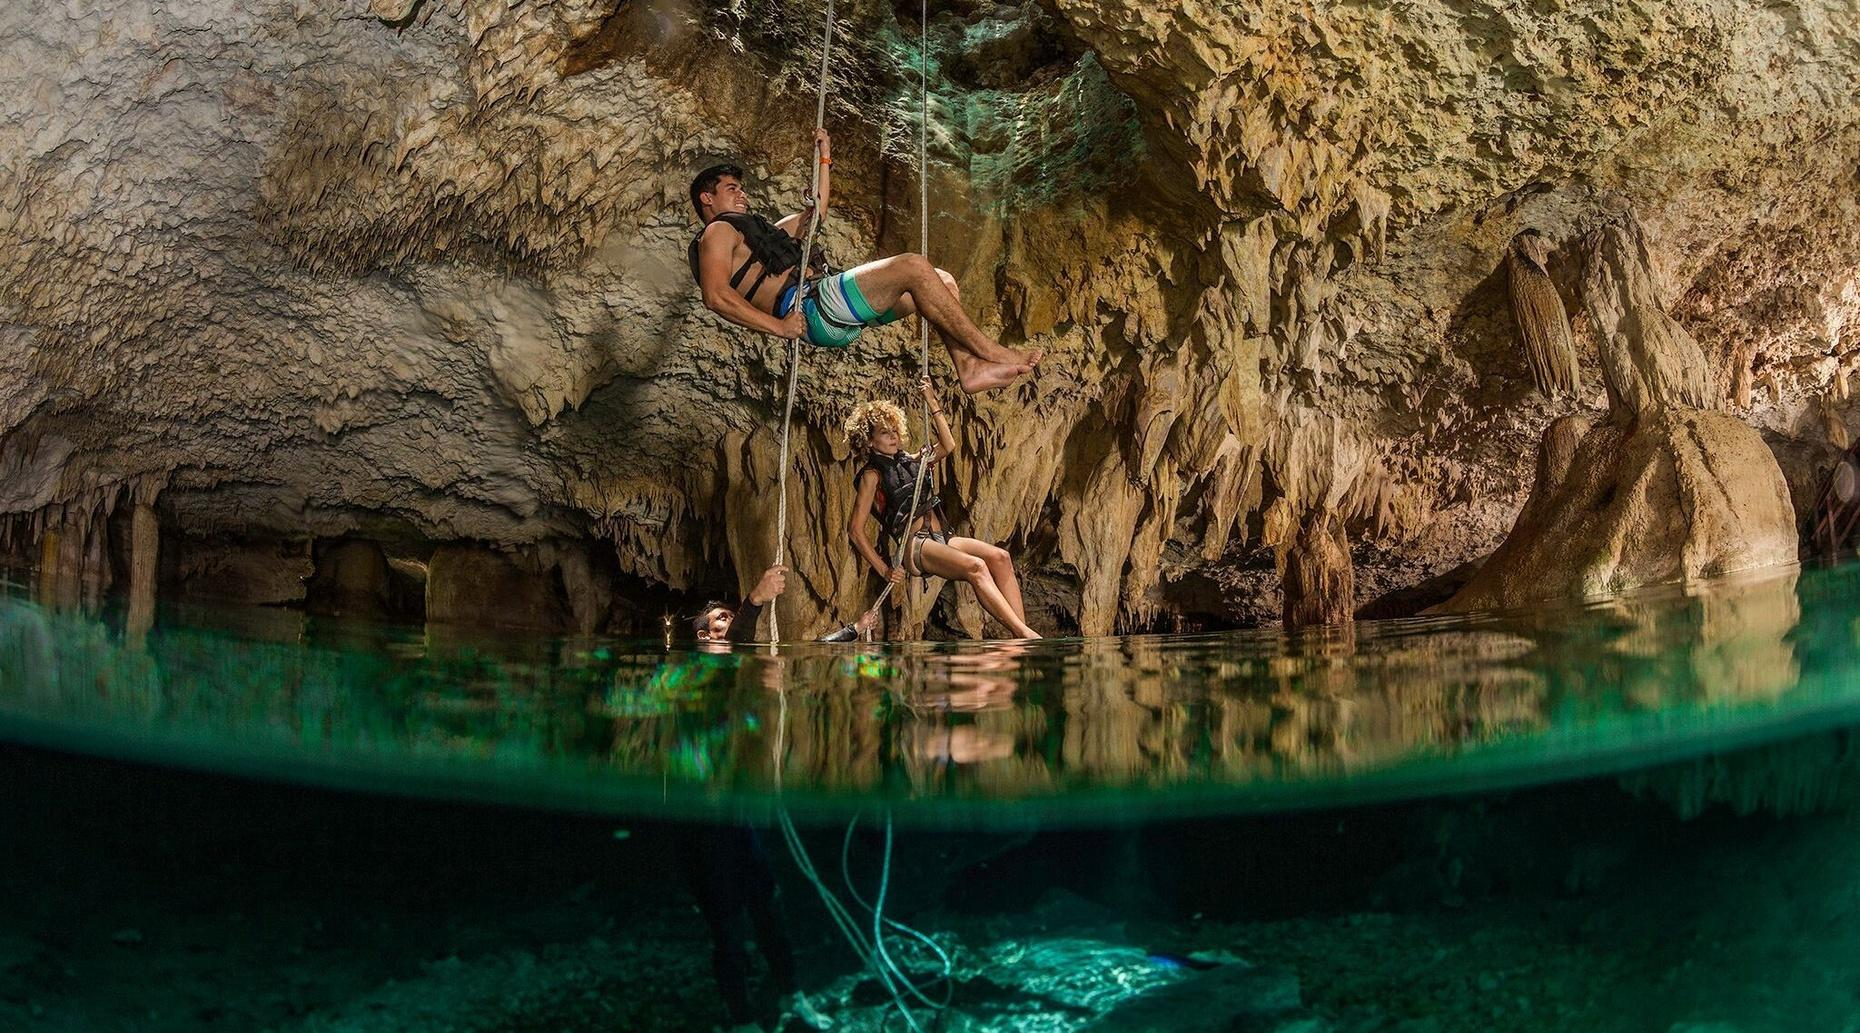 Jungla Maya Native Park Adventure in Cancún